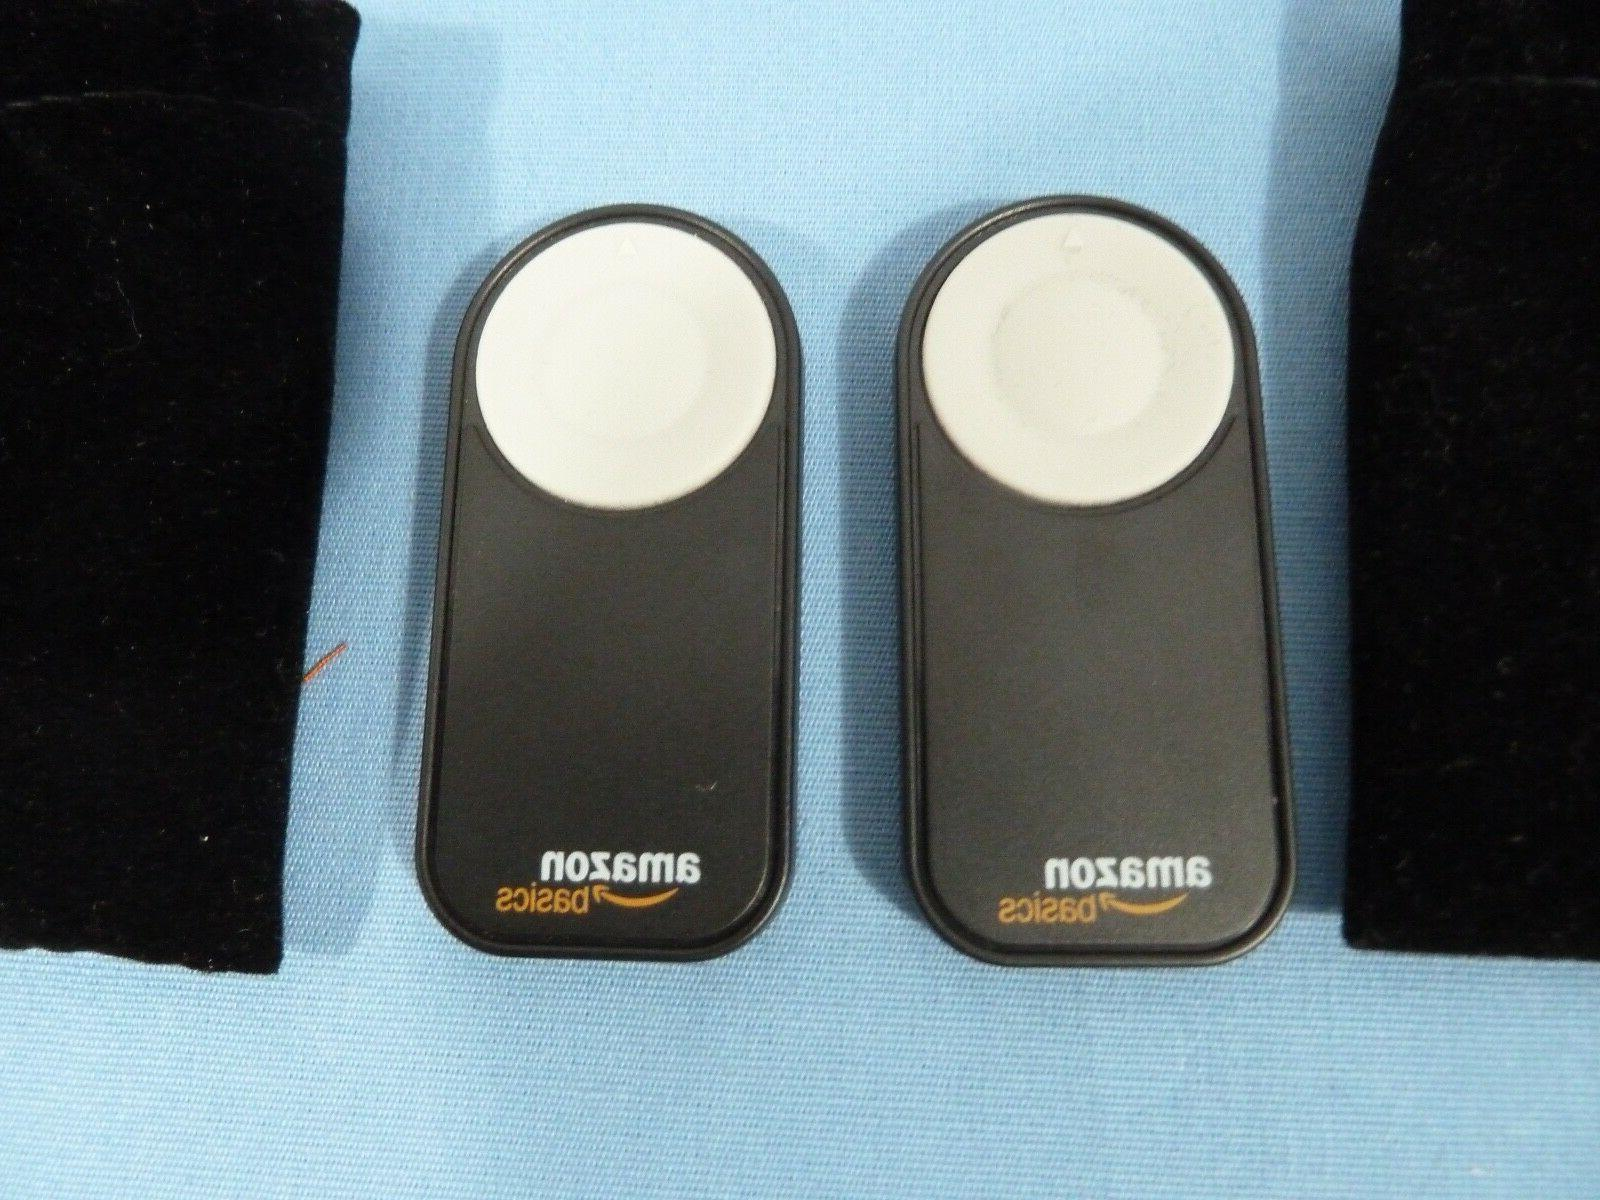 TWO AmazonBasics Wireless Remote Control SLR